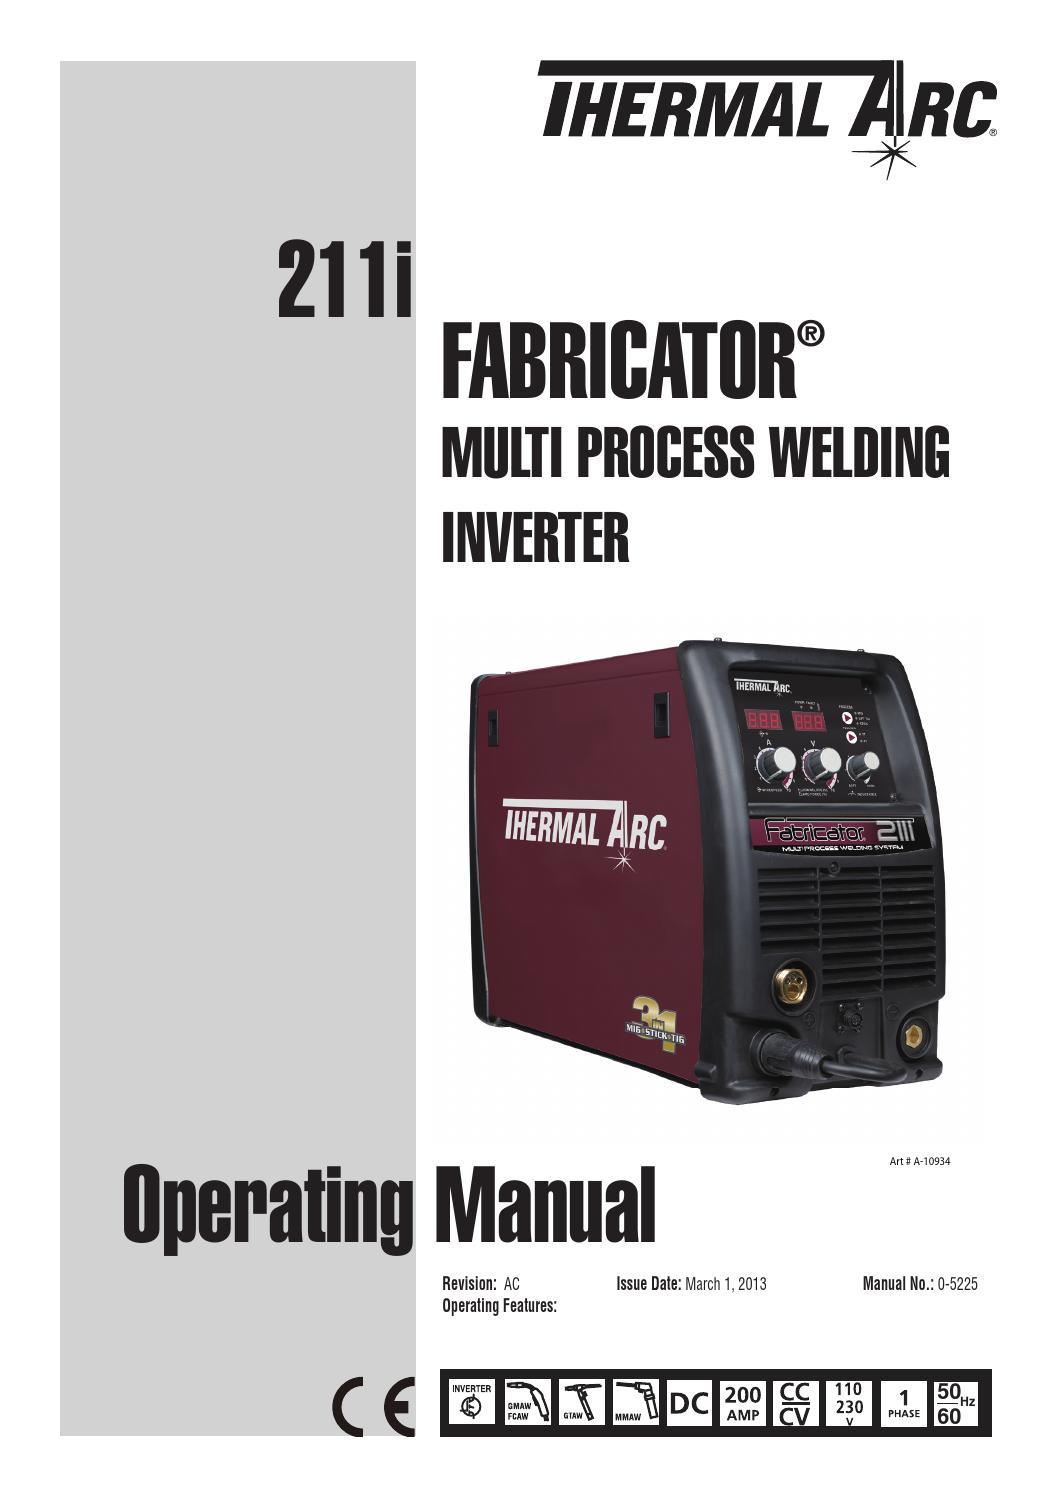 Fabricator 211 Manual By United Welding Supplies Issuu Mode Inverter Arc Welder Schematic On Igbt